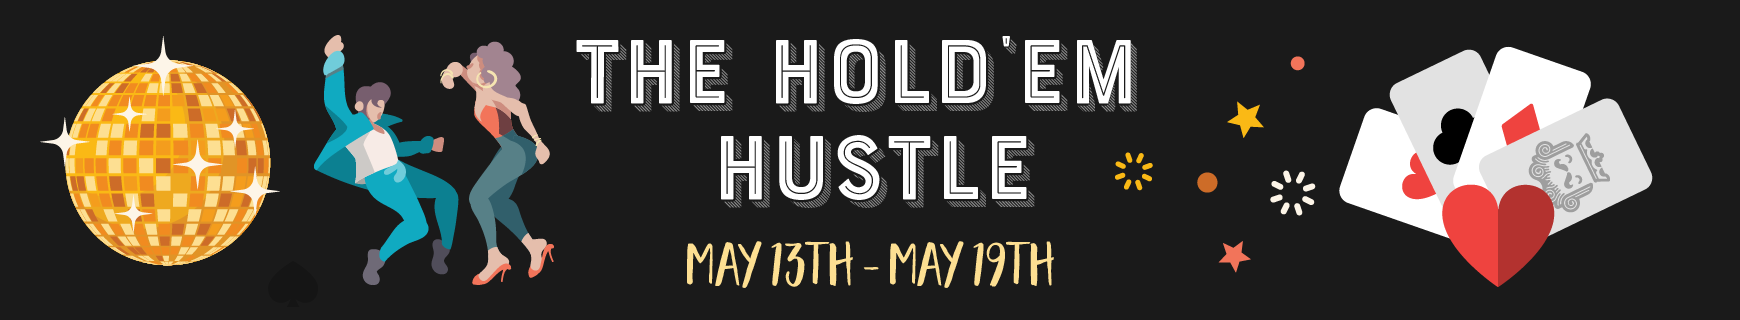 The hold'em hustle %28870 x 160%29 2x %282%29